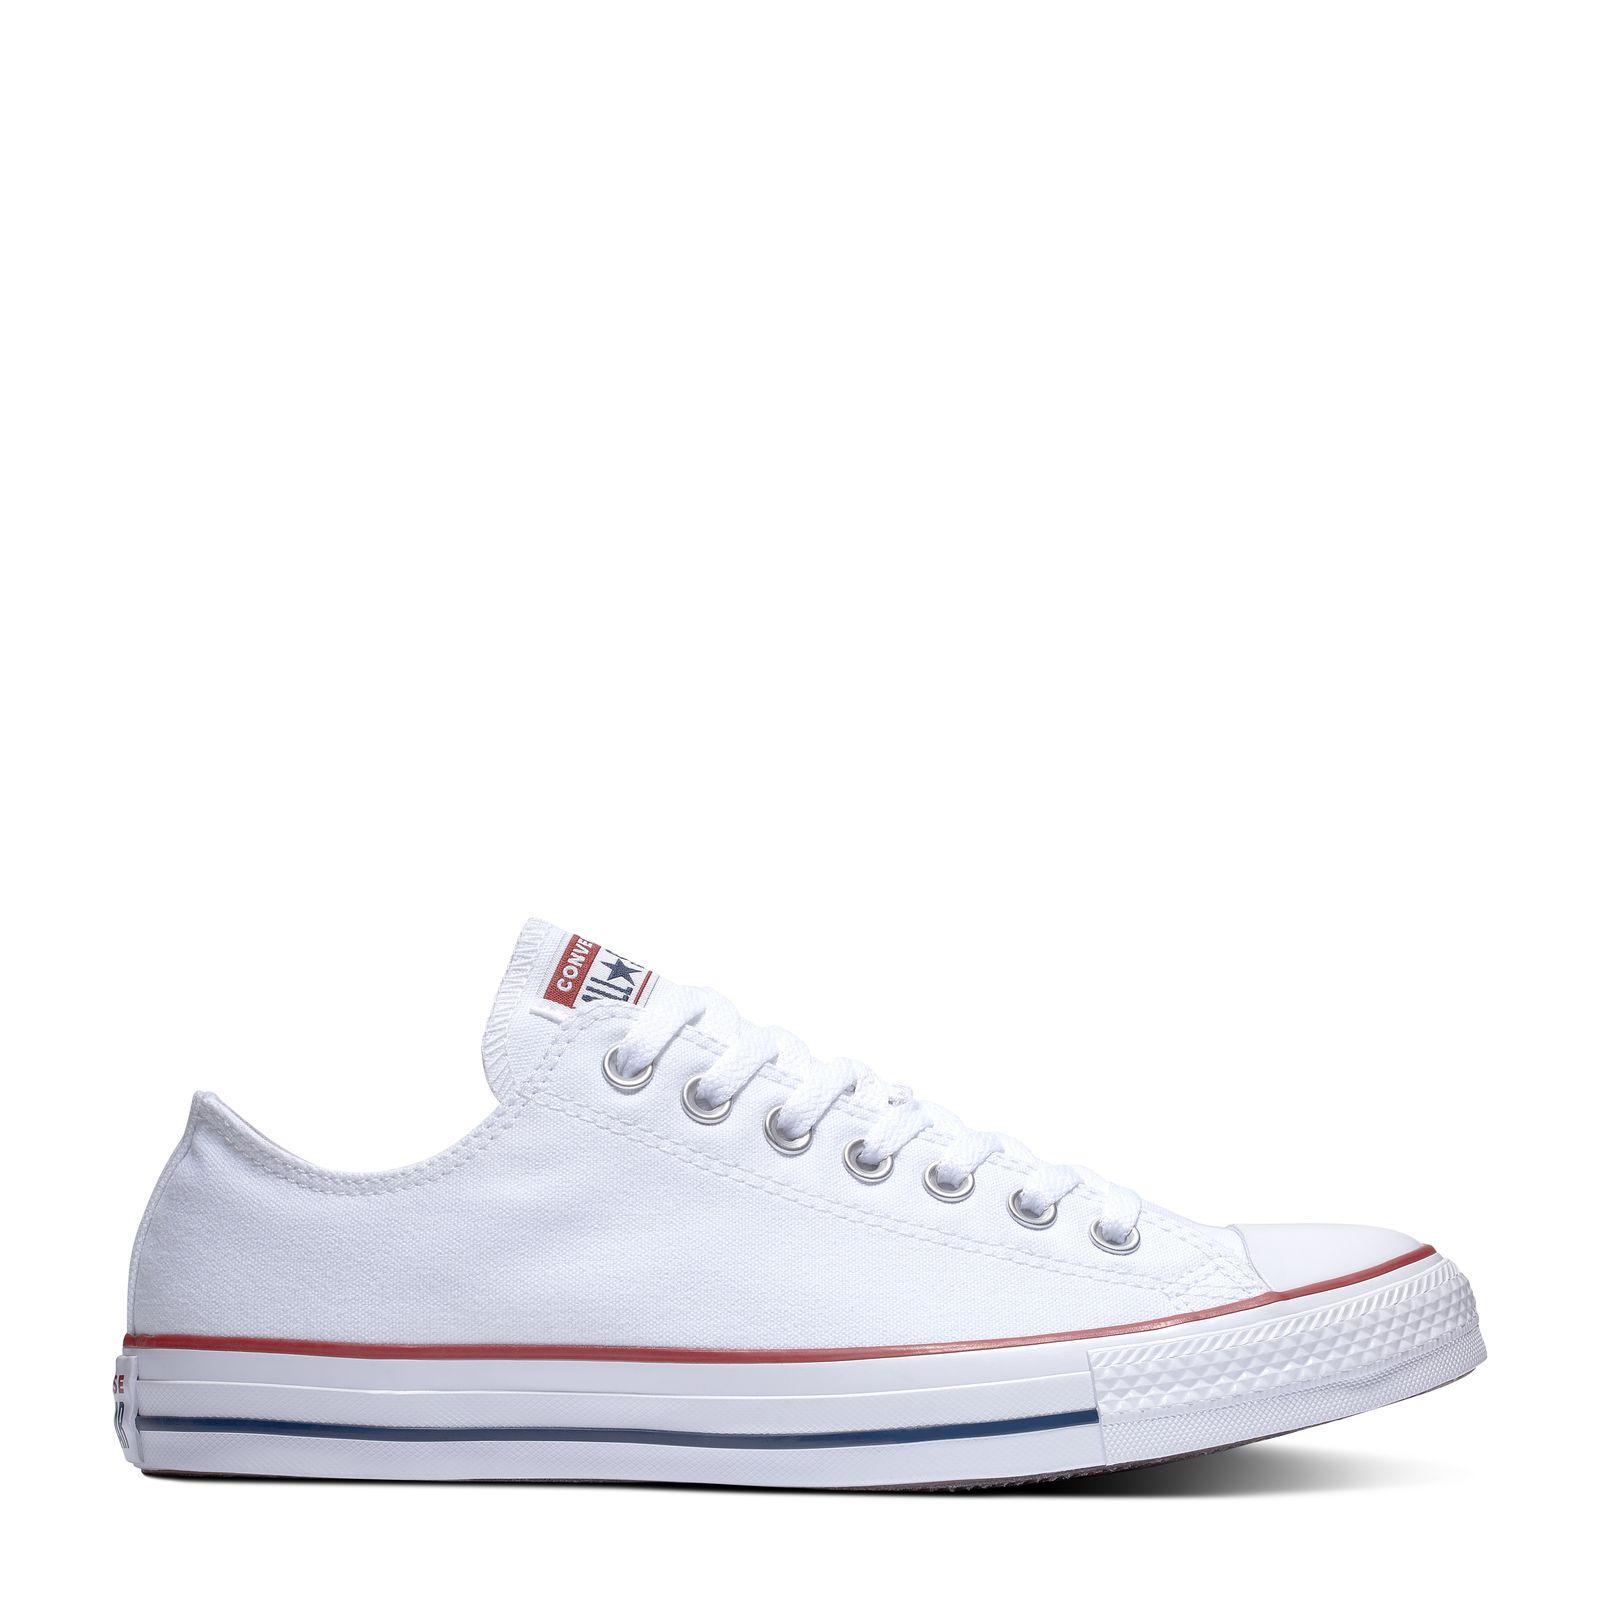 b16e1ba7cc Converse Philippines: Converse price list - Shoes for Men & Women ...